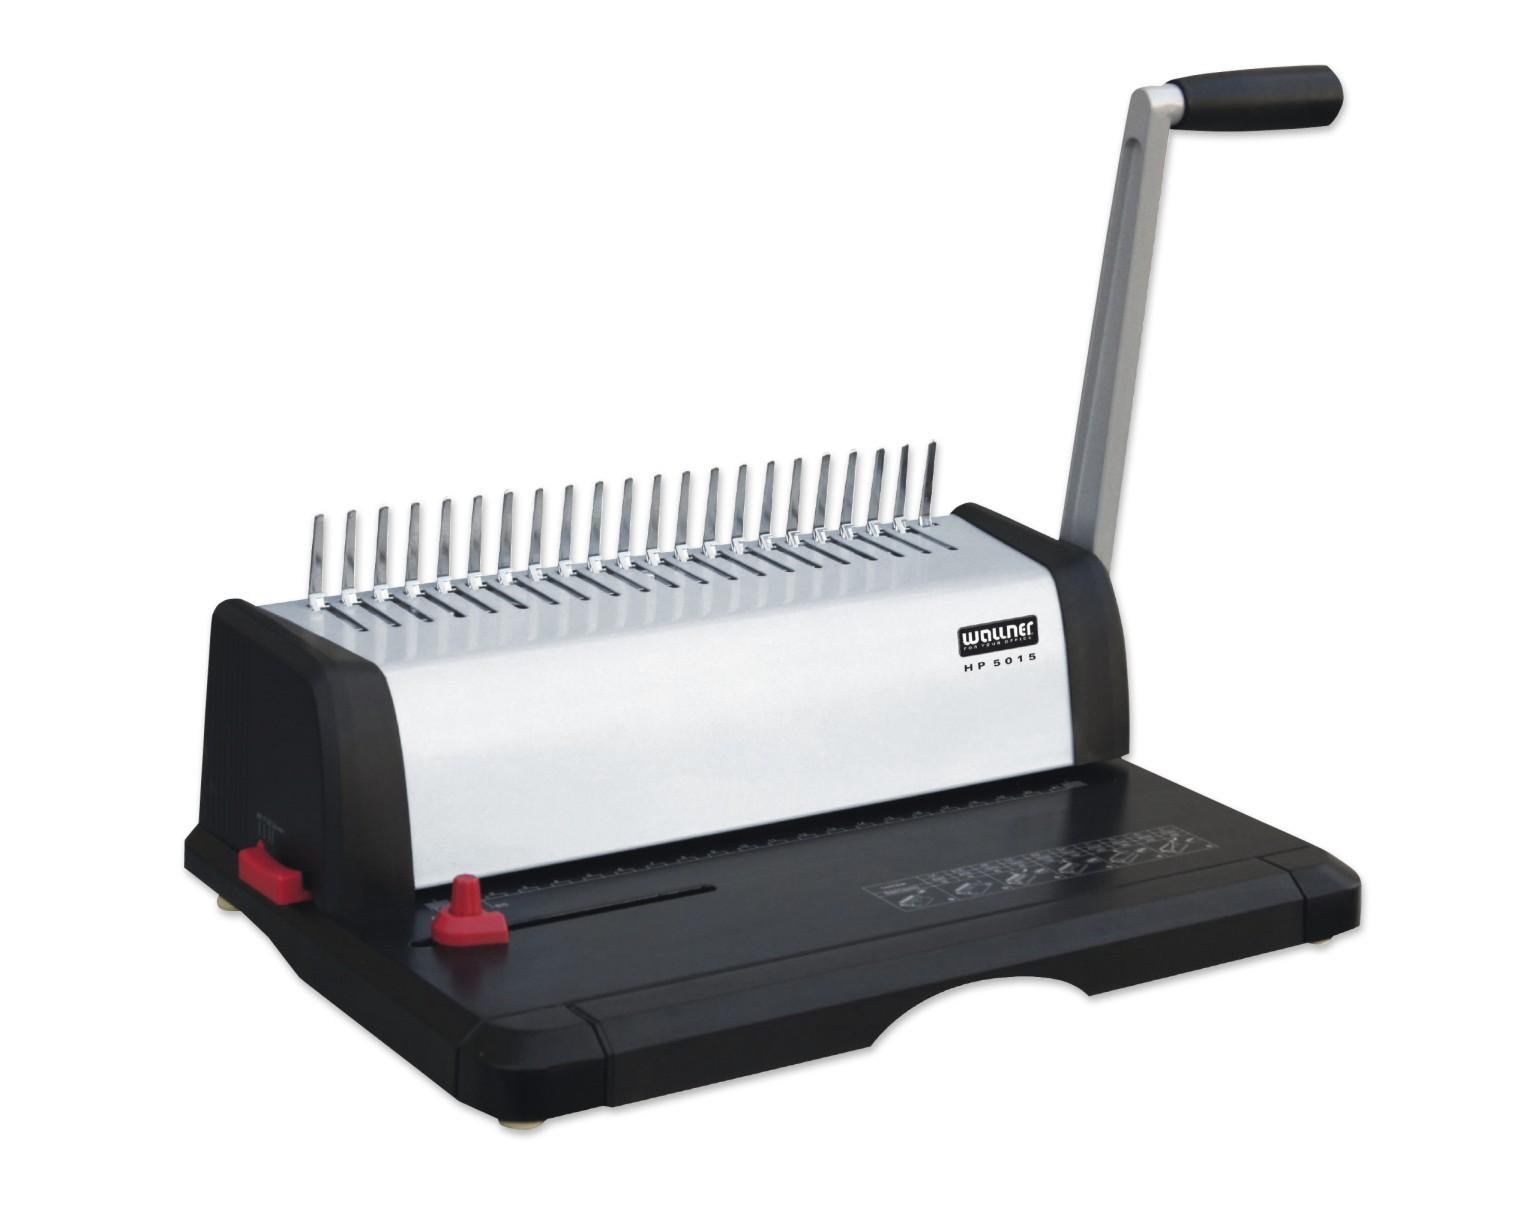 Vazač HP 5015